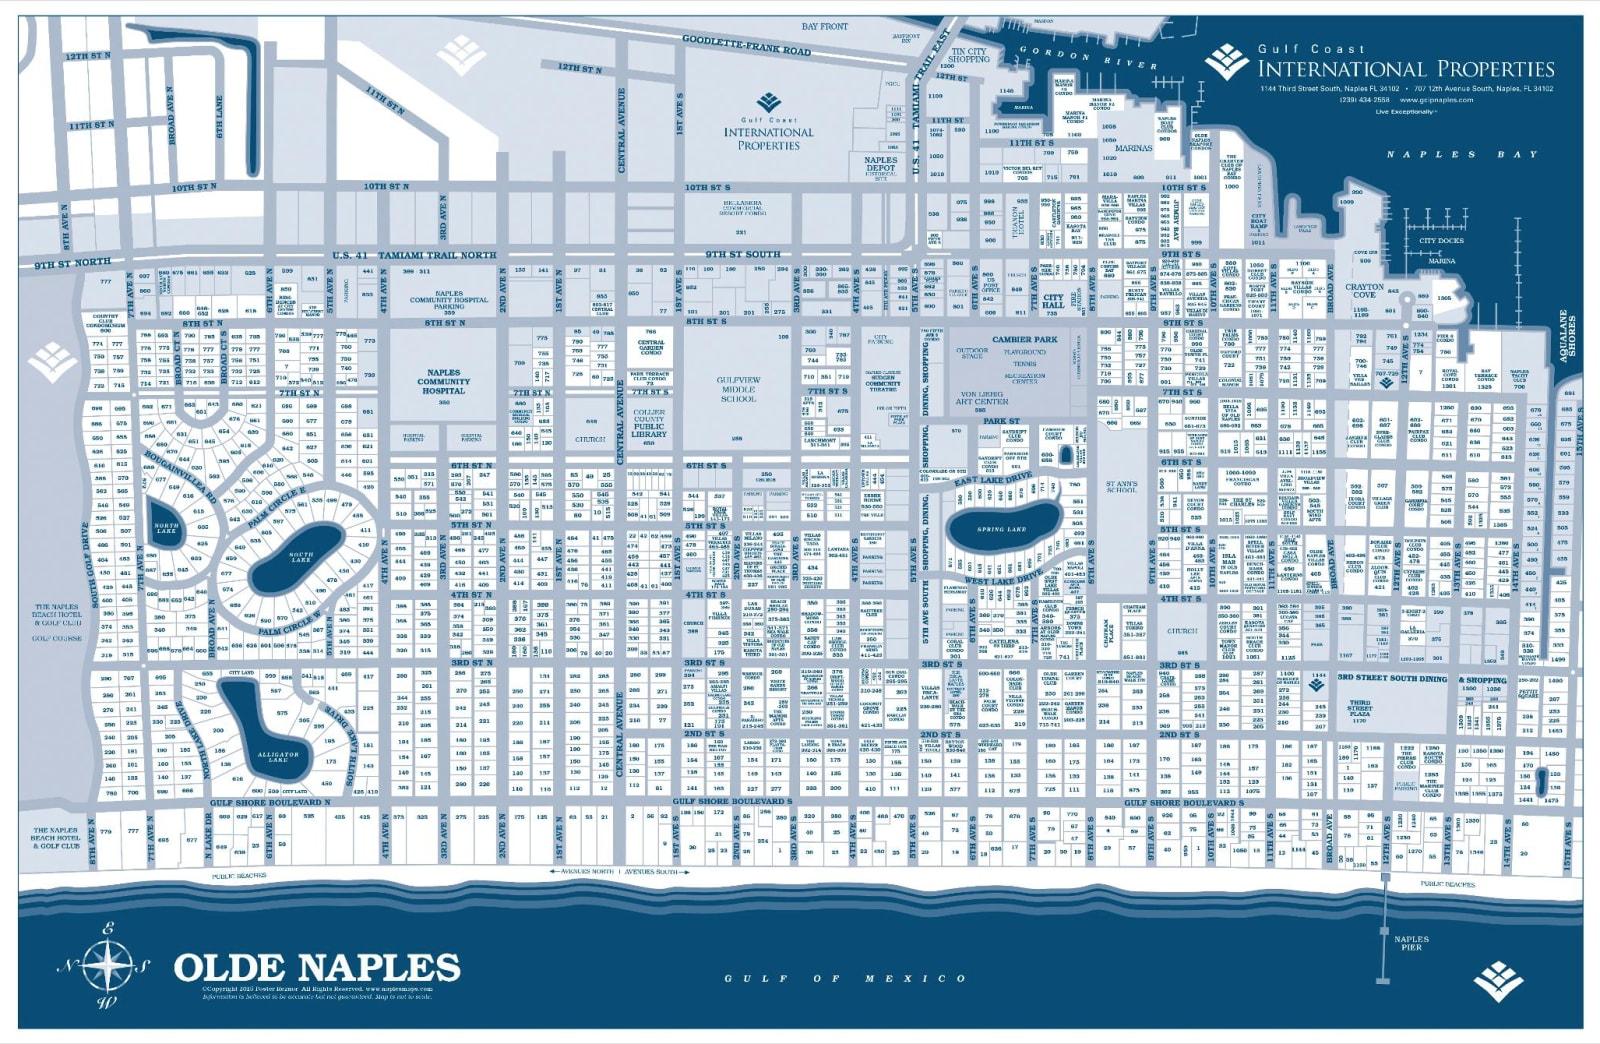 Old Naples Mao